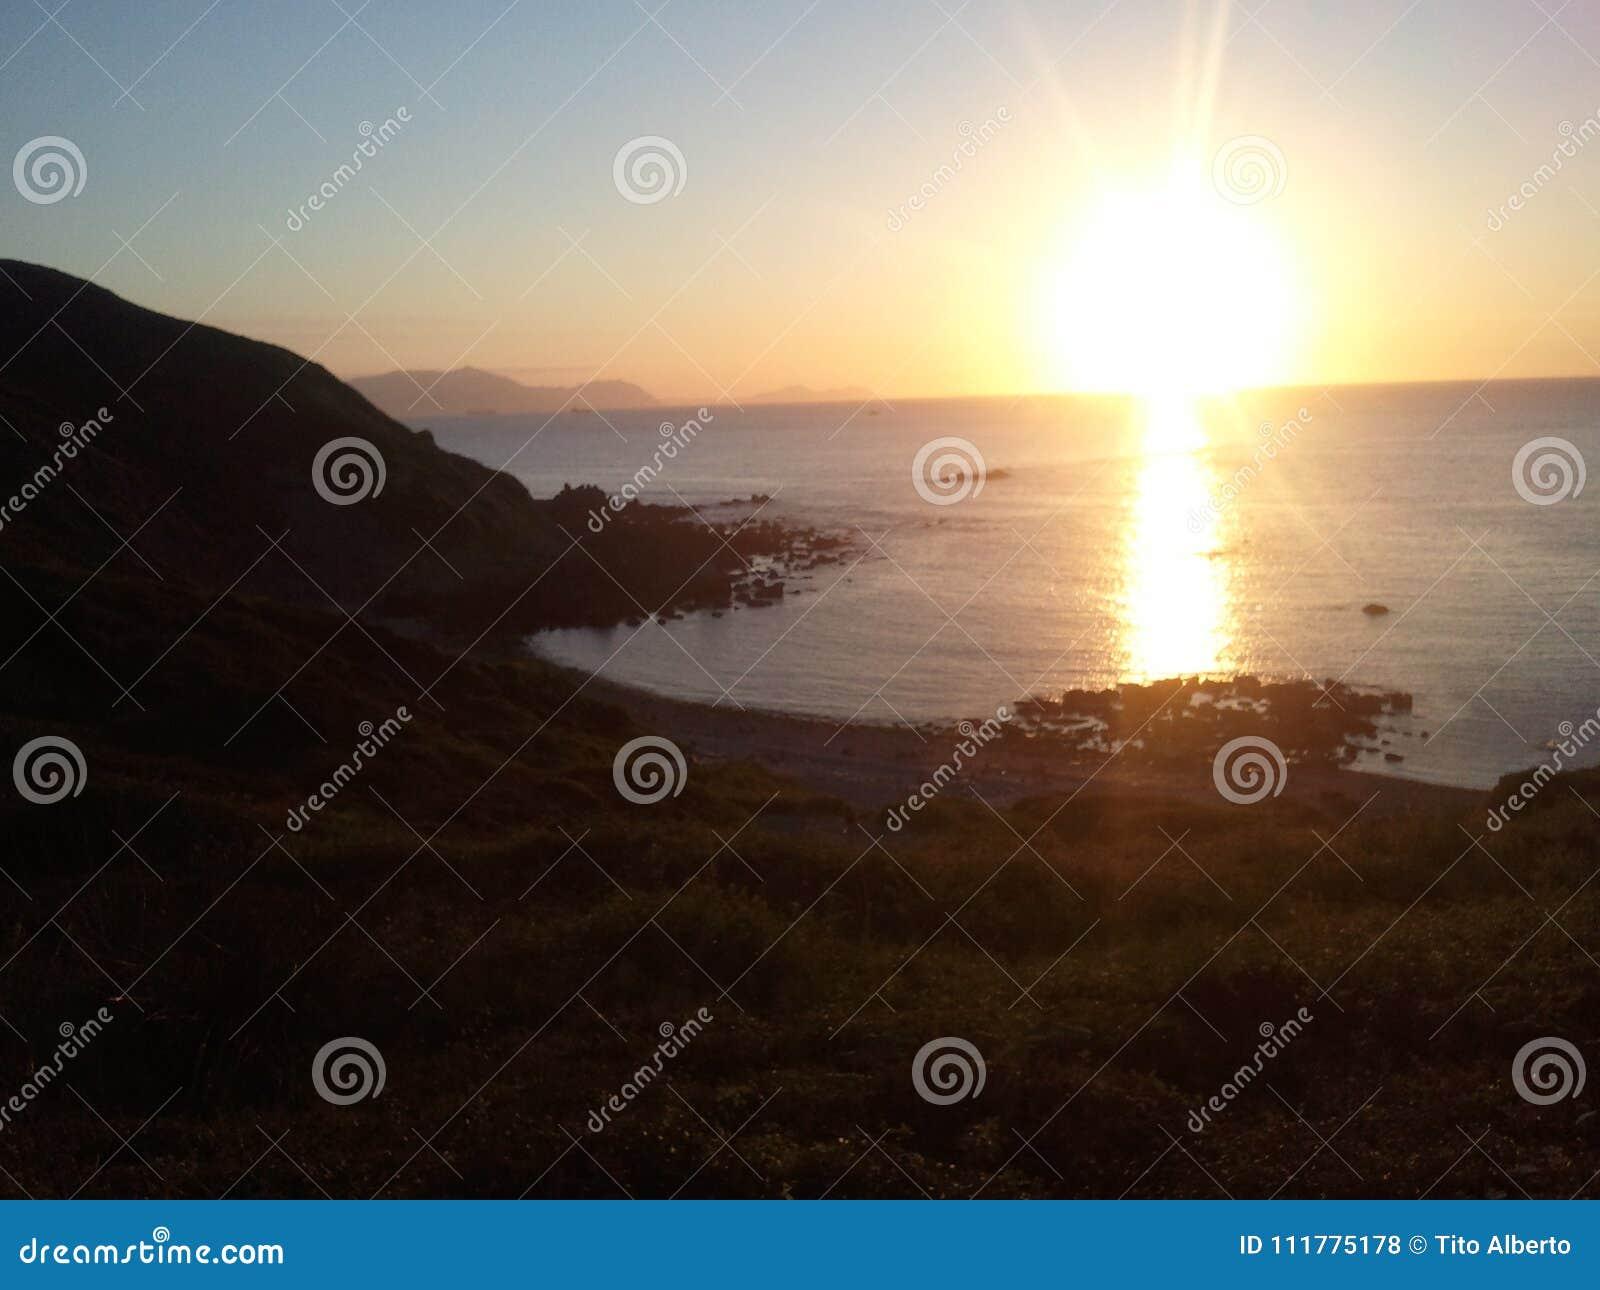 Basque countri sunset